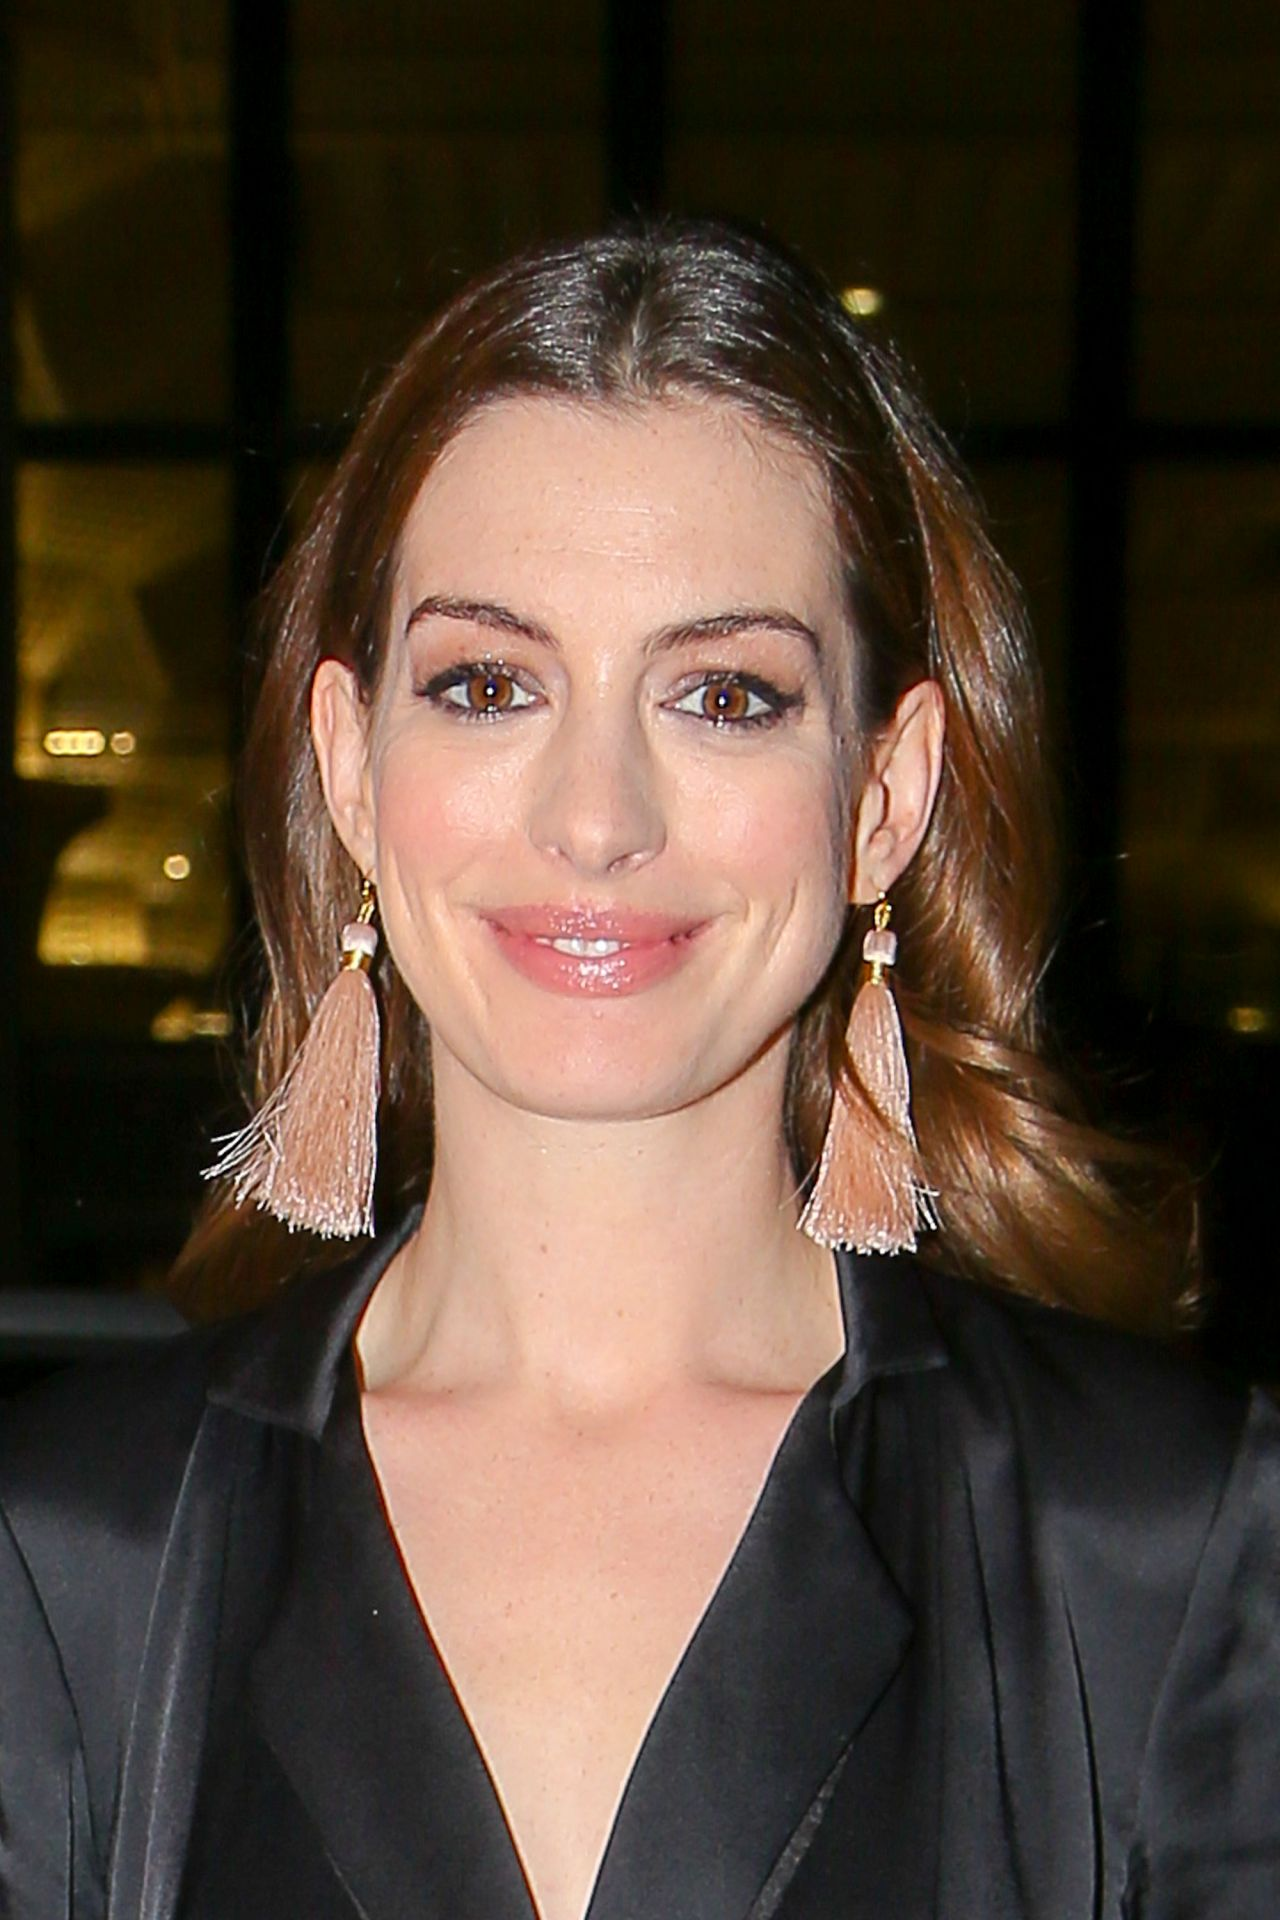 Anne Hathaway Latest Photos - CelebMafia Anne Hathaway